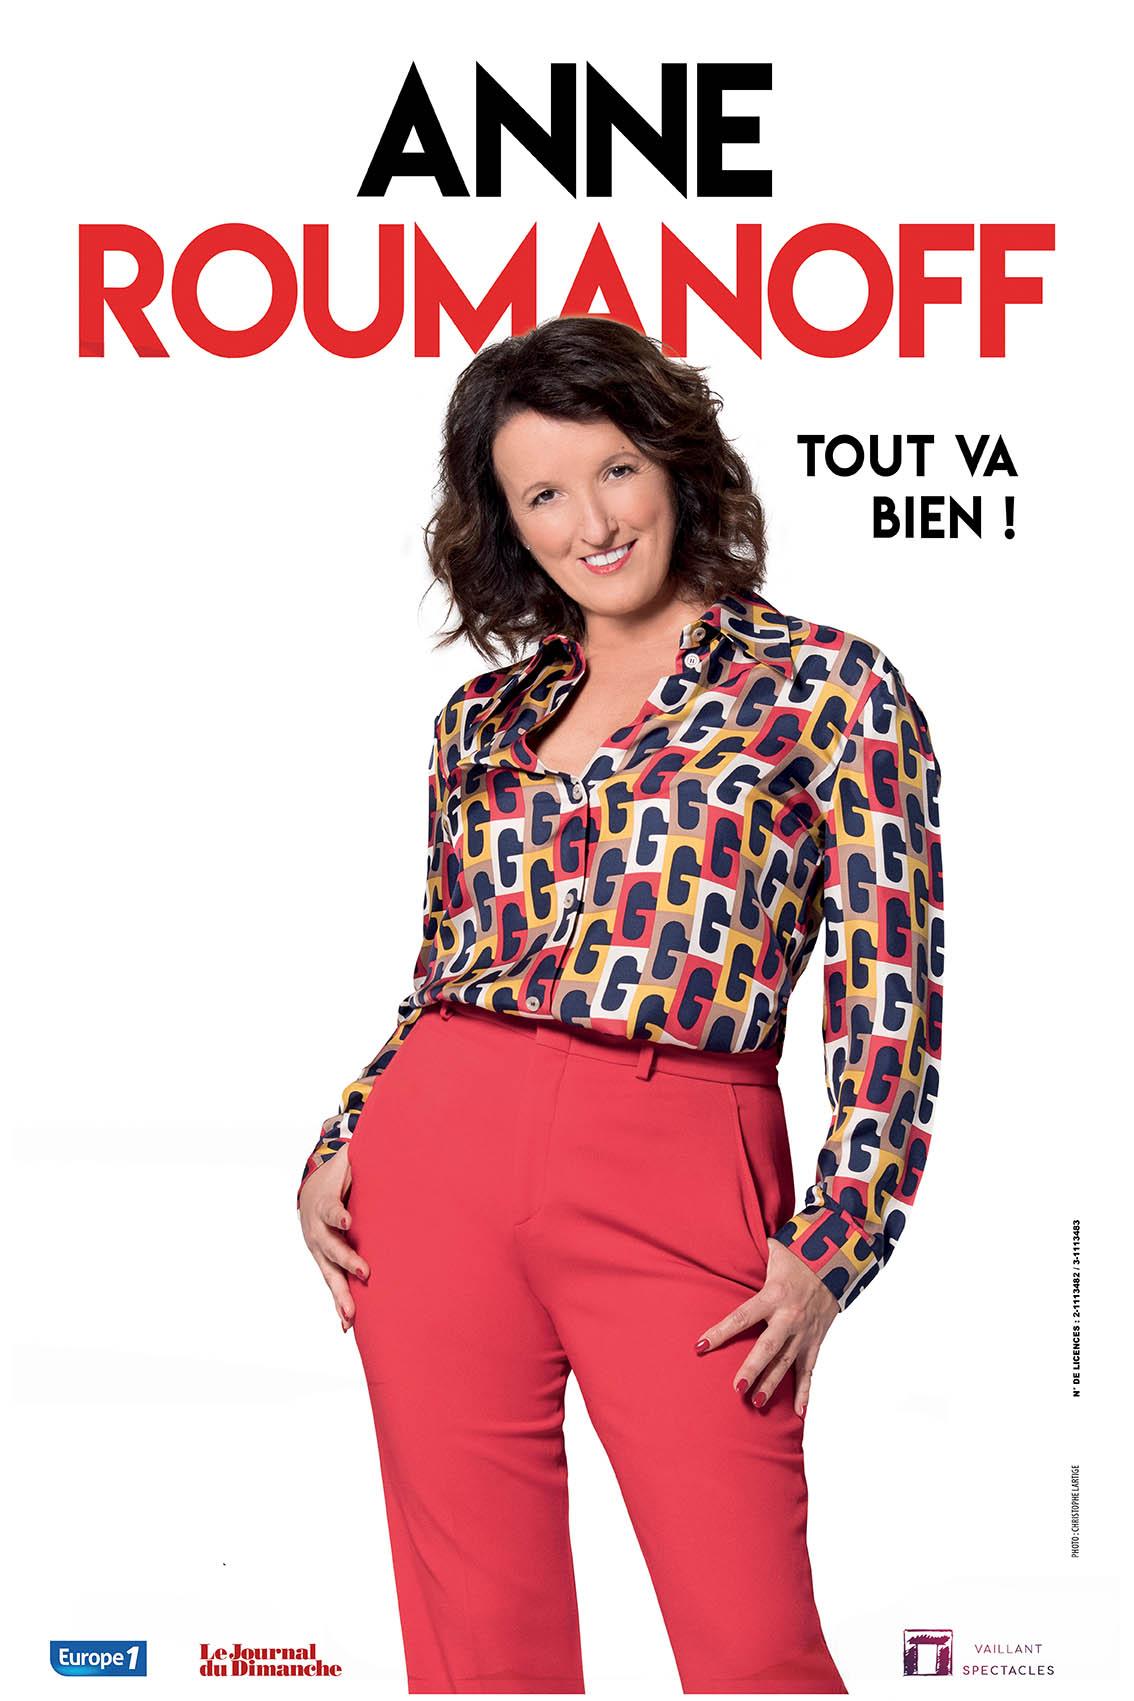 Anne Roumanoff - Tout va bien !